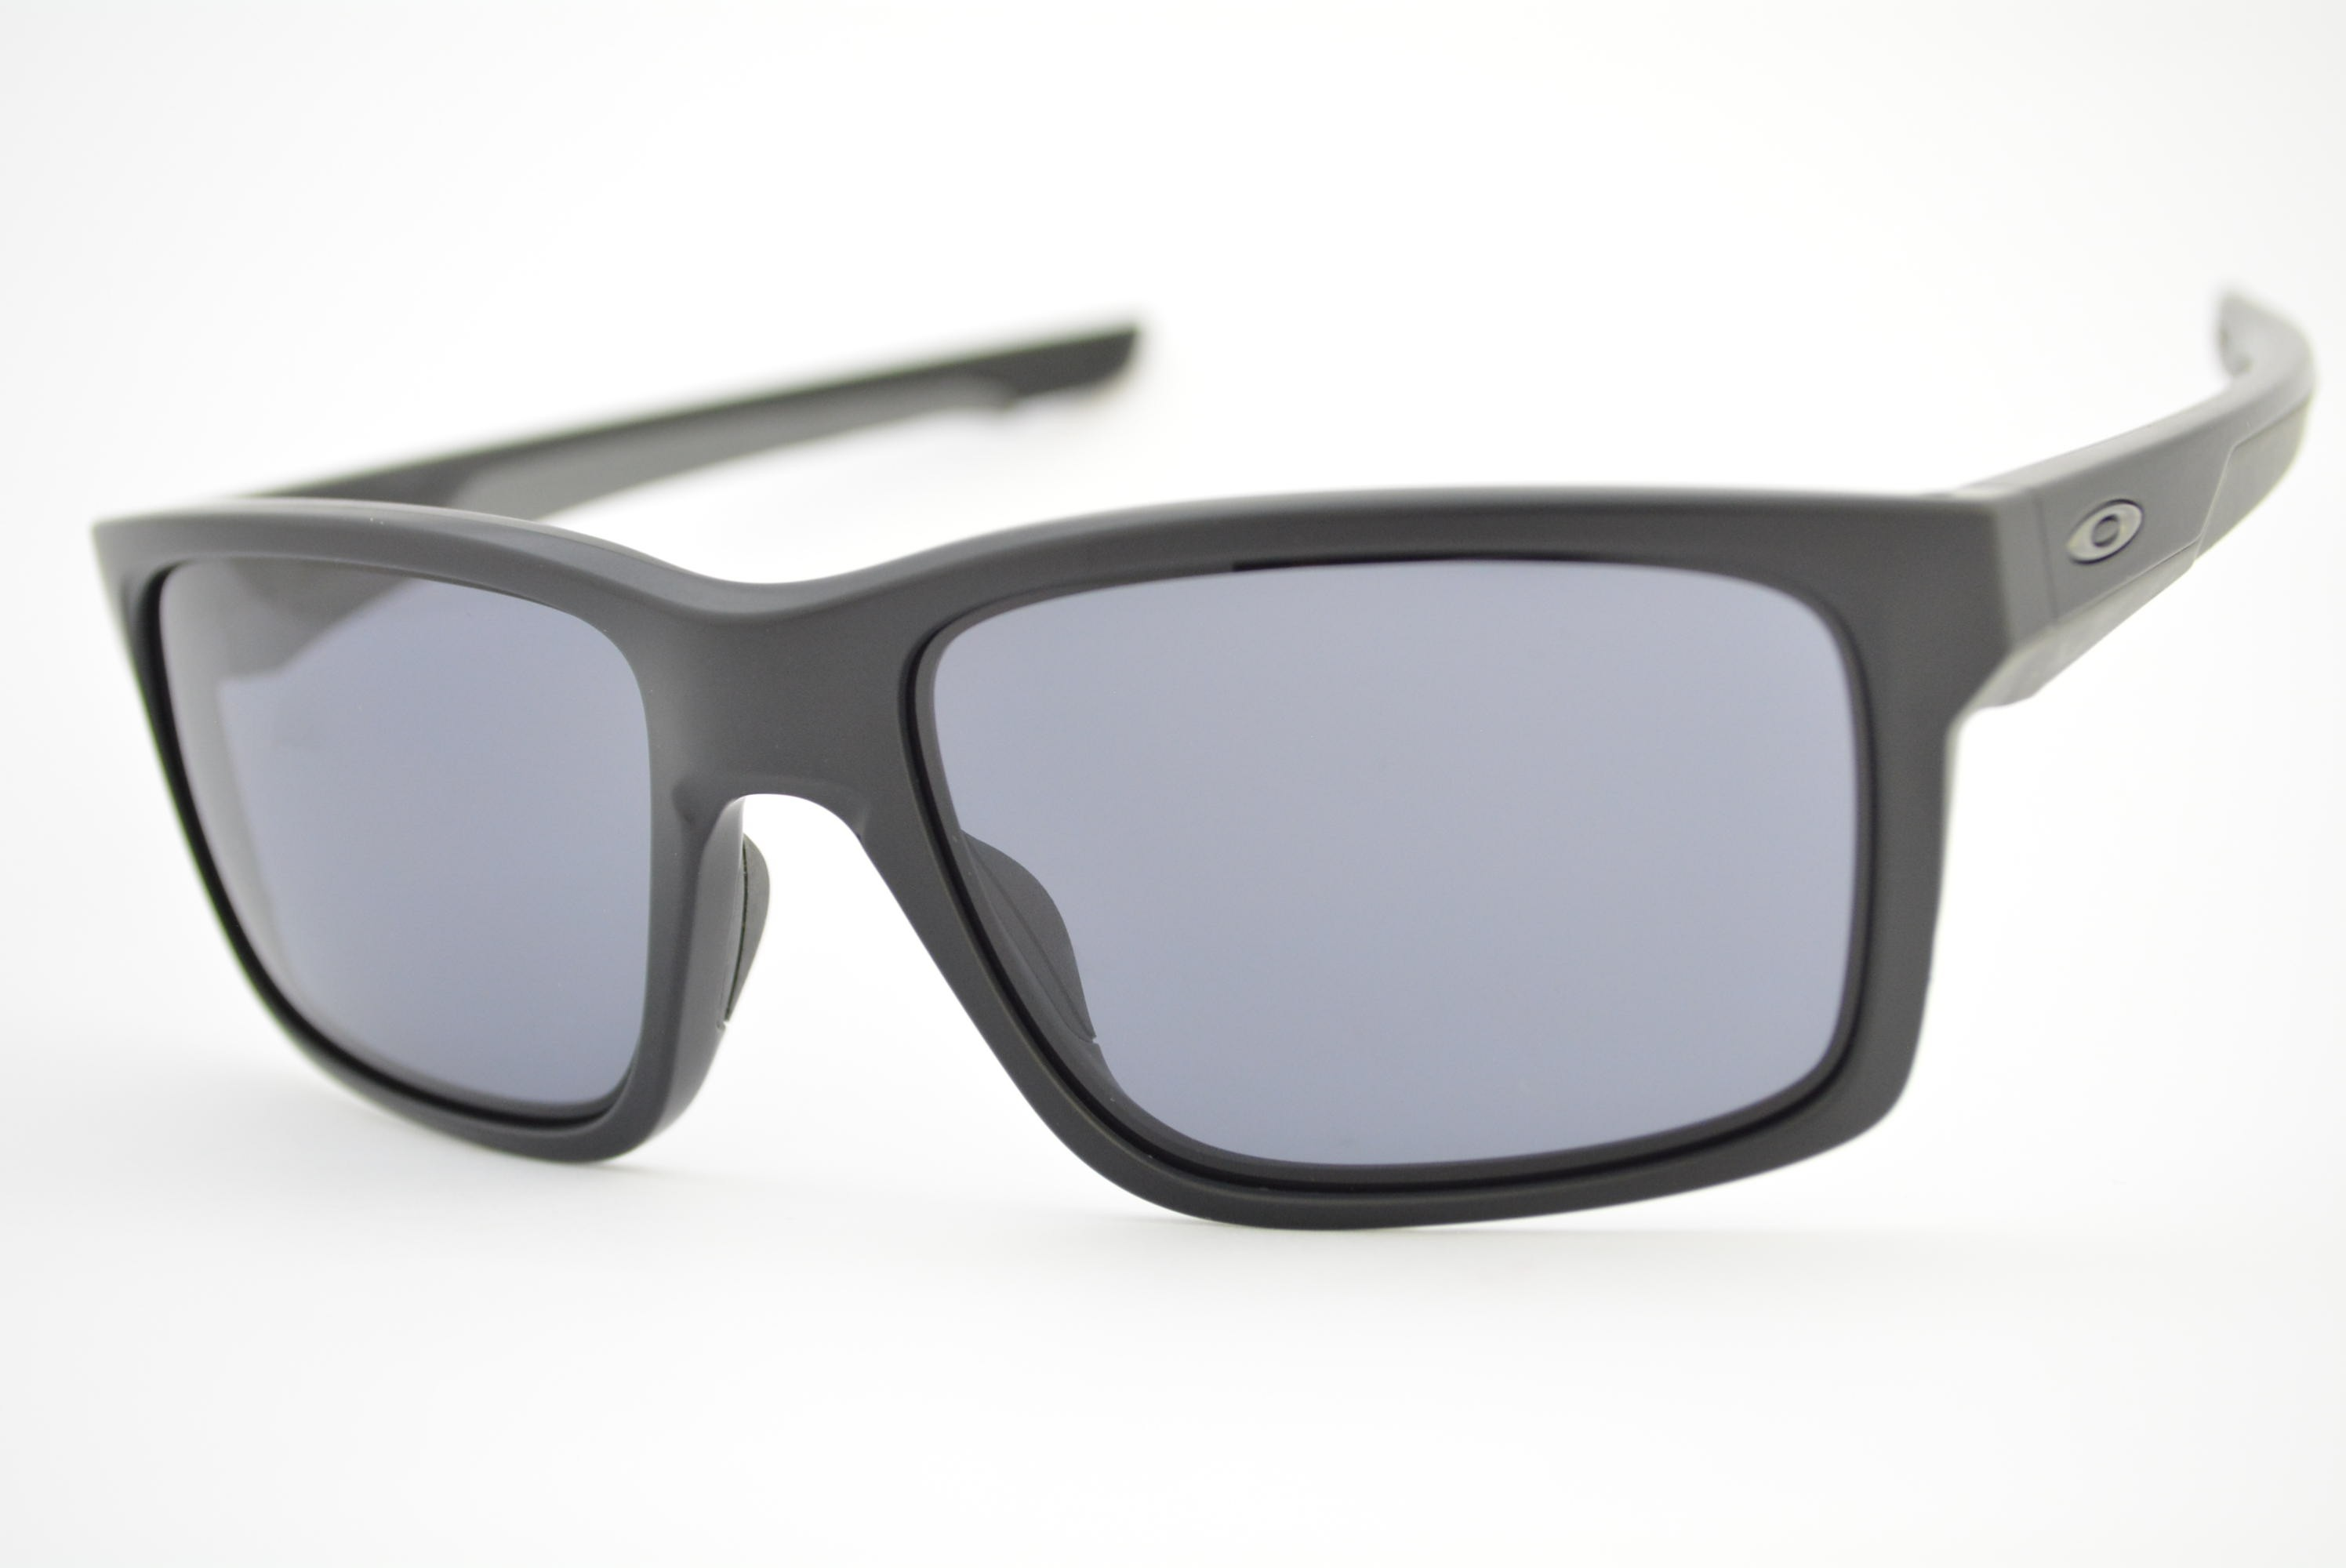 b3aac67186068 óculos de sol Oakley mod Mainlink matte black w grey 009264-01 Ótica ...